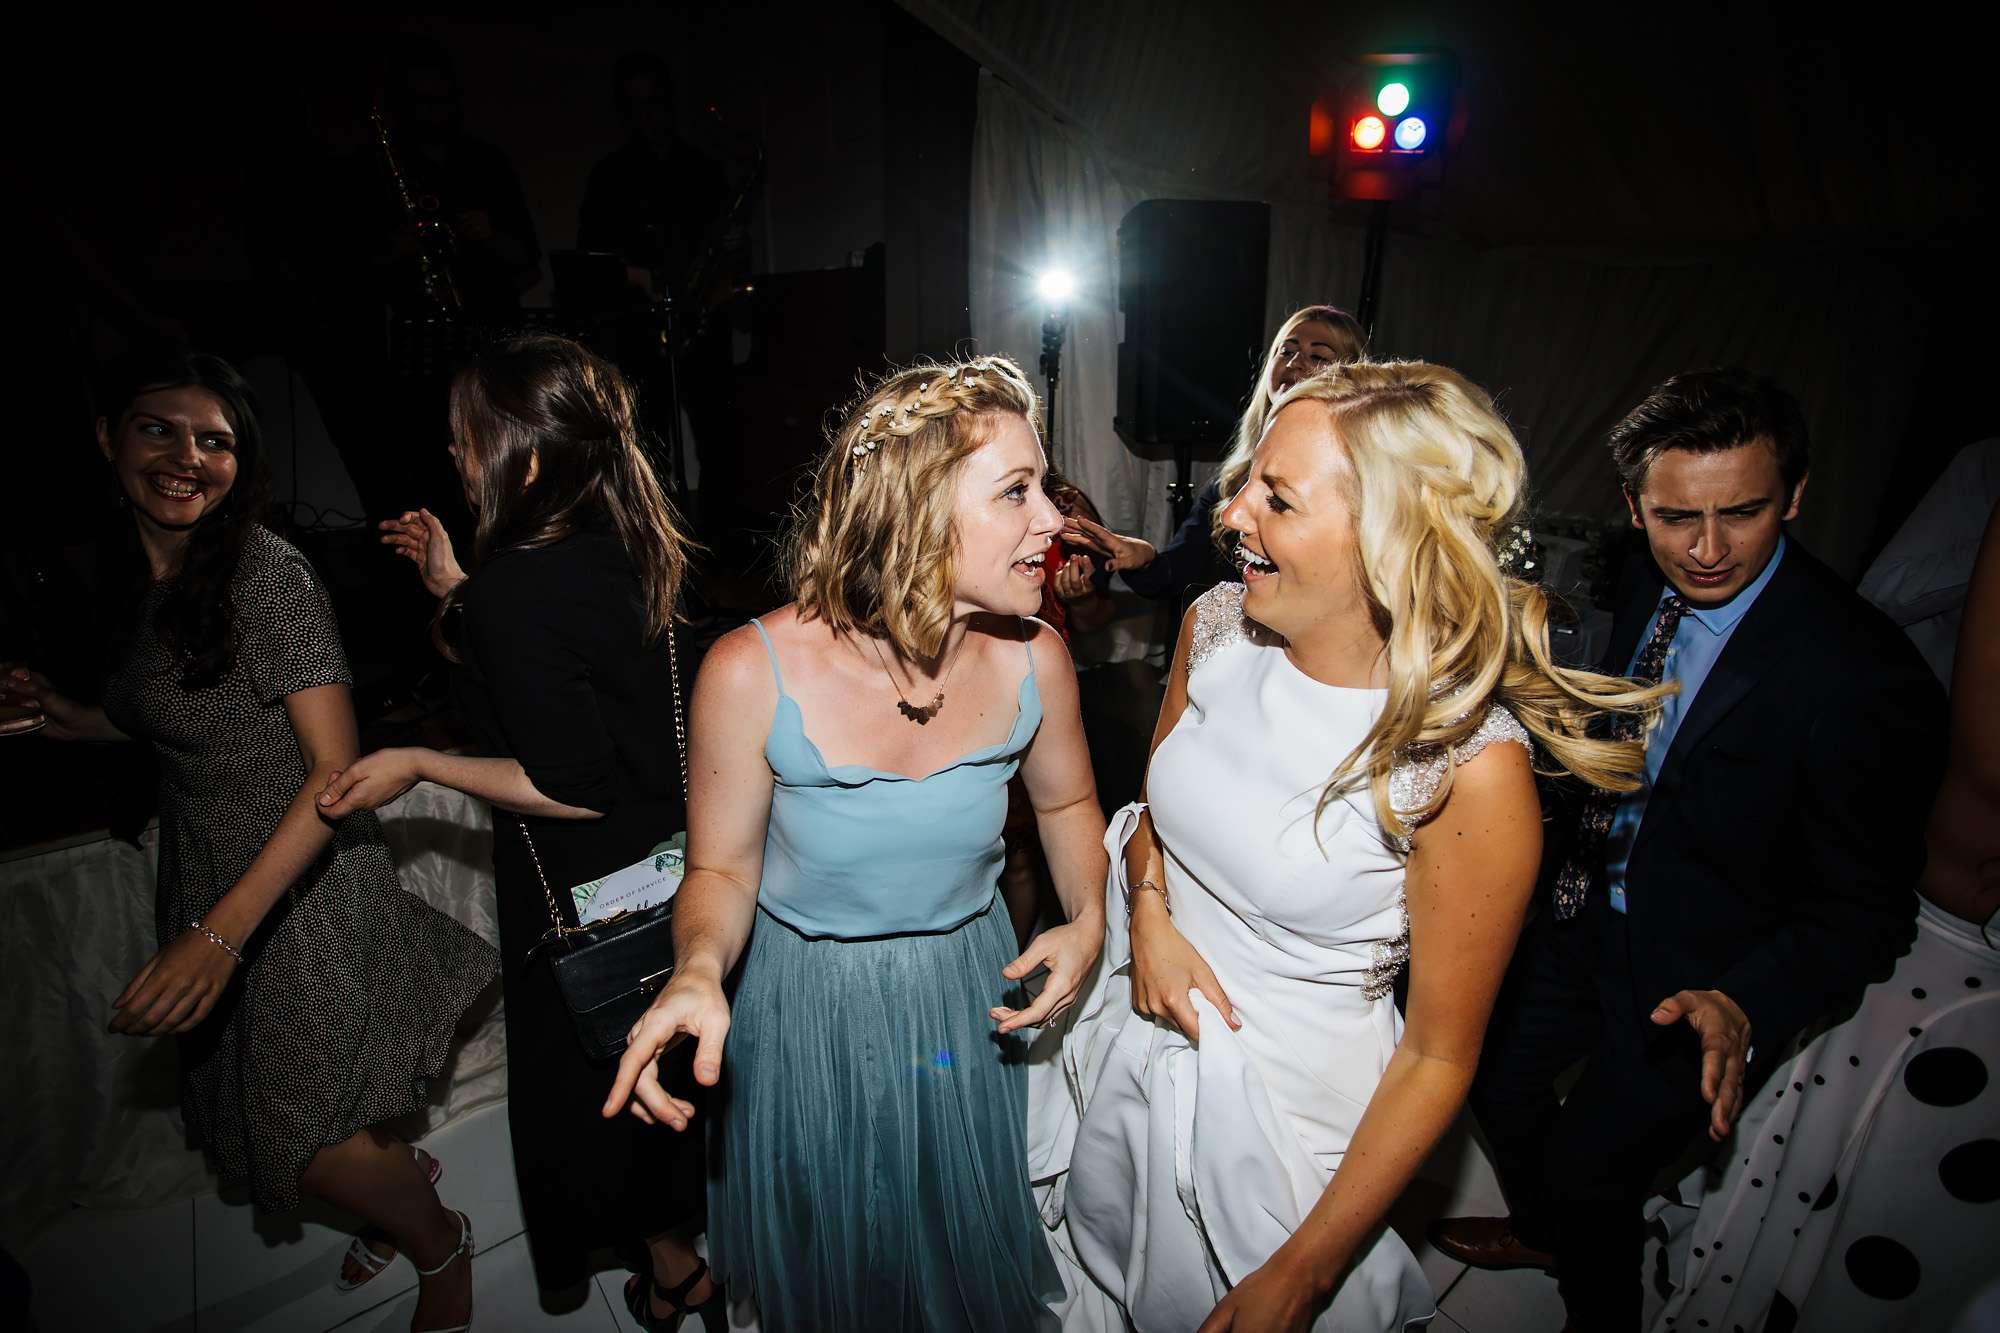 Dance floor fun times at East Keswick Village Hall wedding